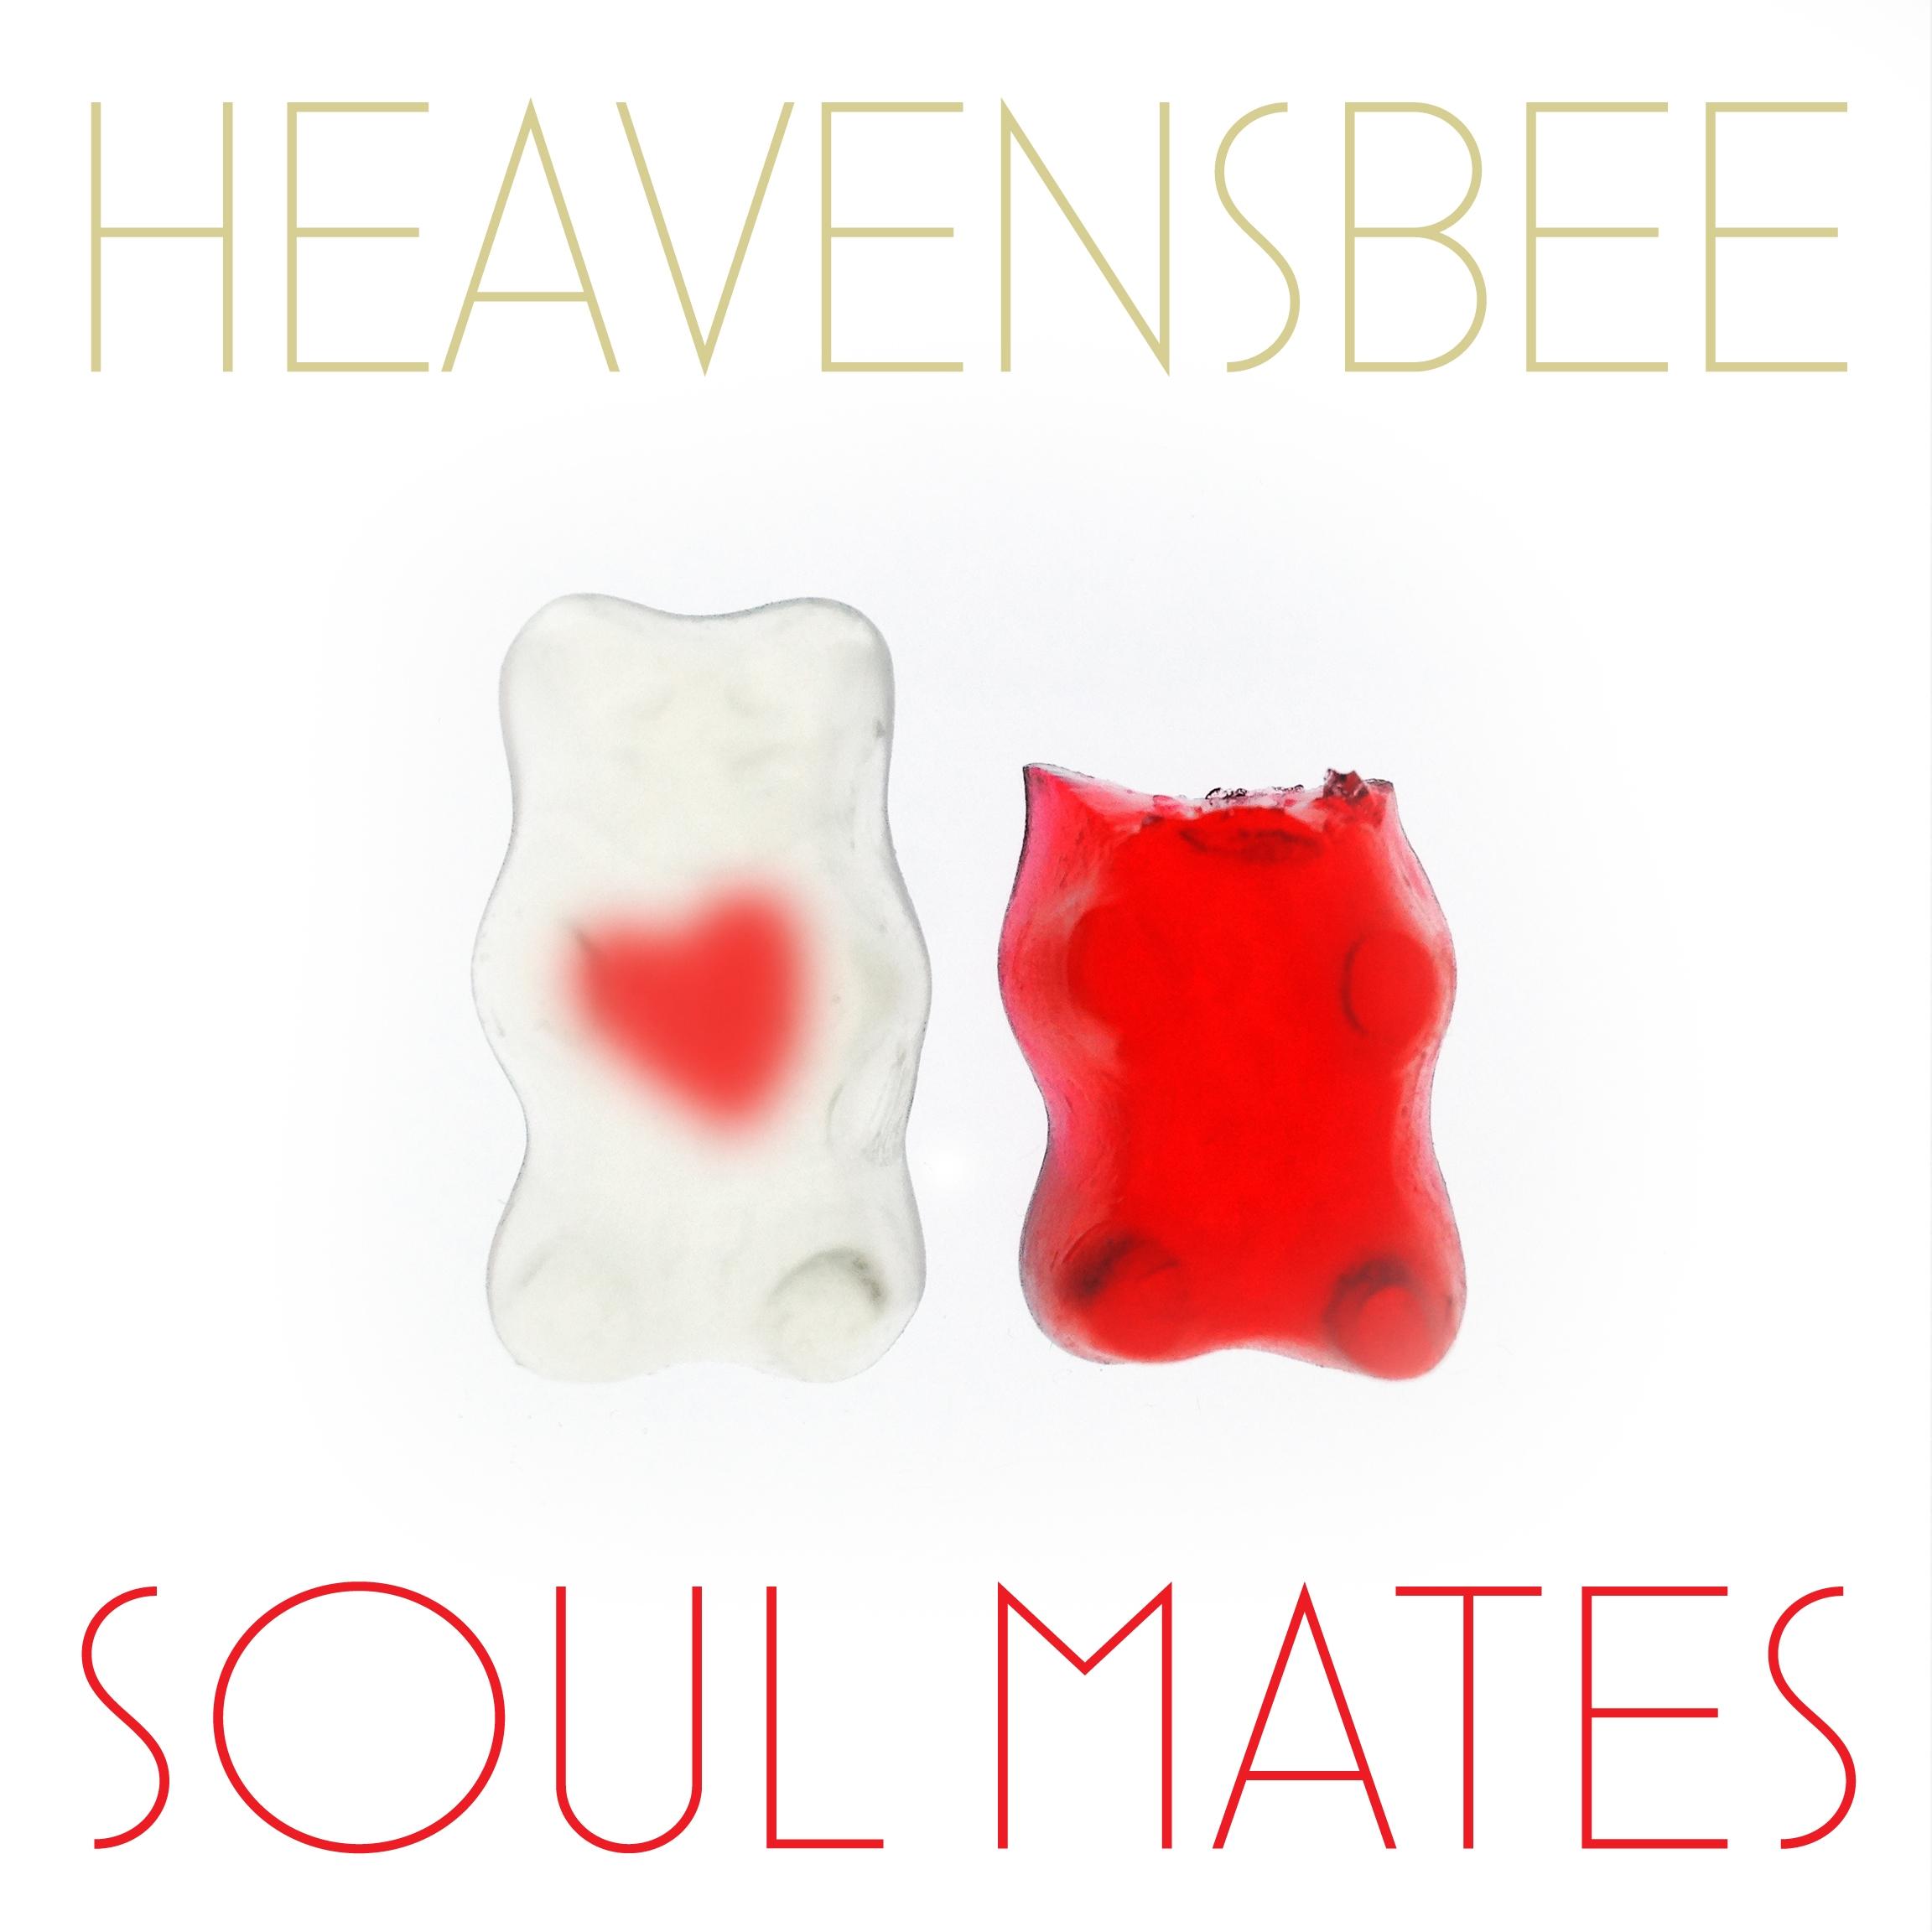 hb_soulmates_cover.jpg